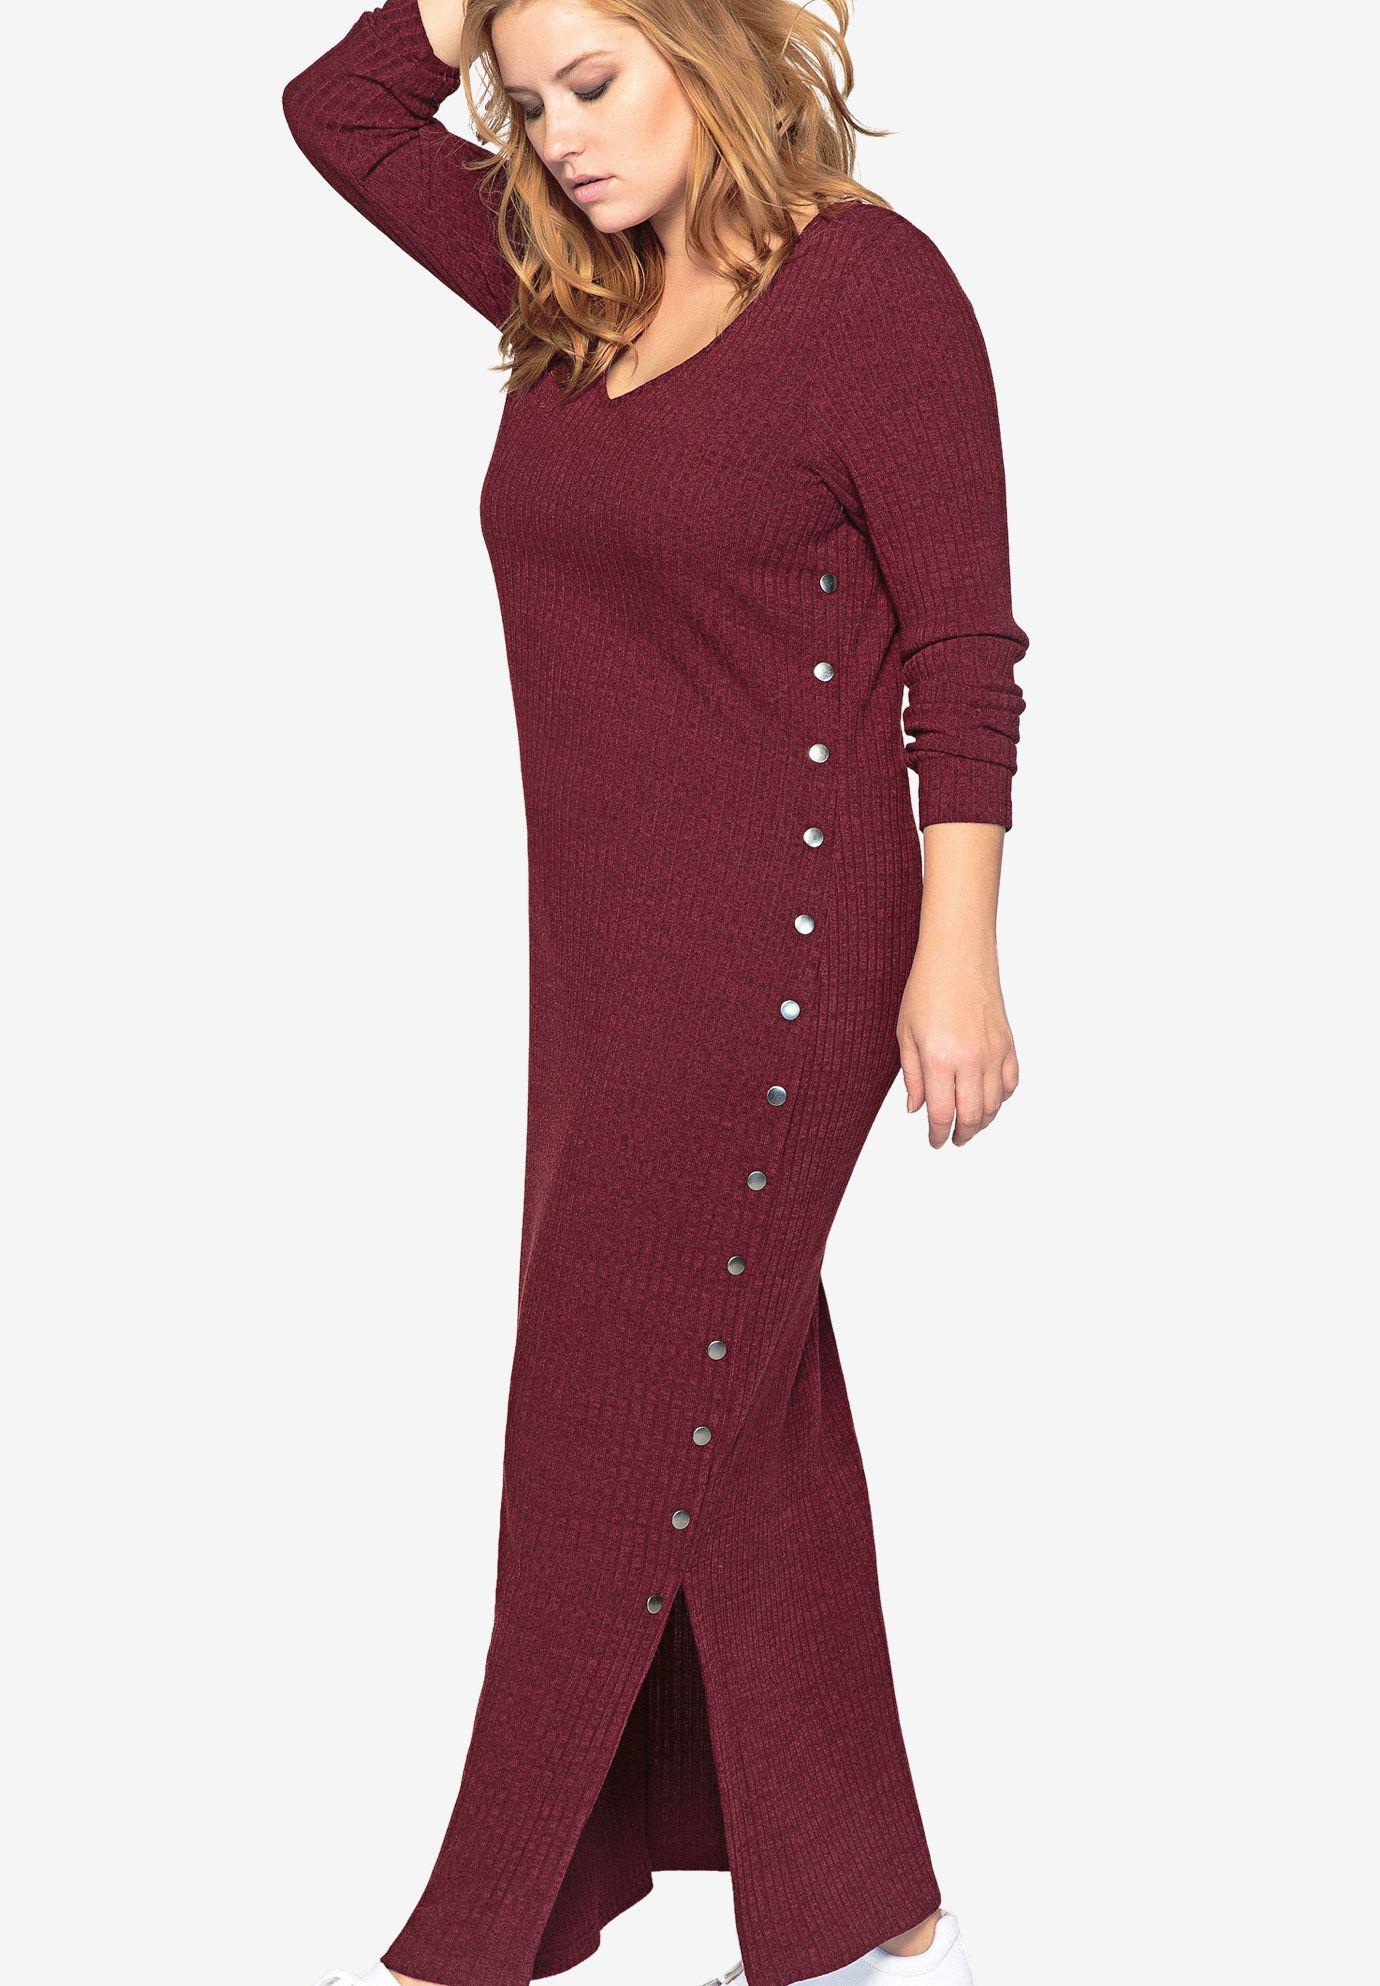 Long Sleeve Knit Maxi Dress By Castaluna